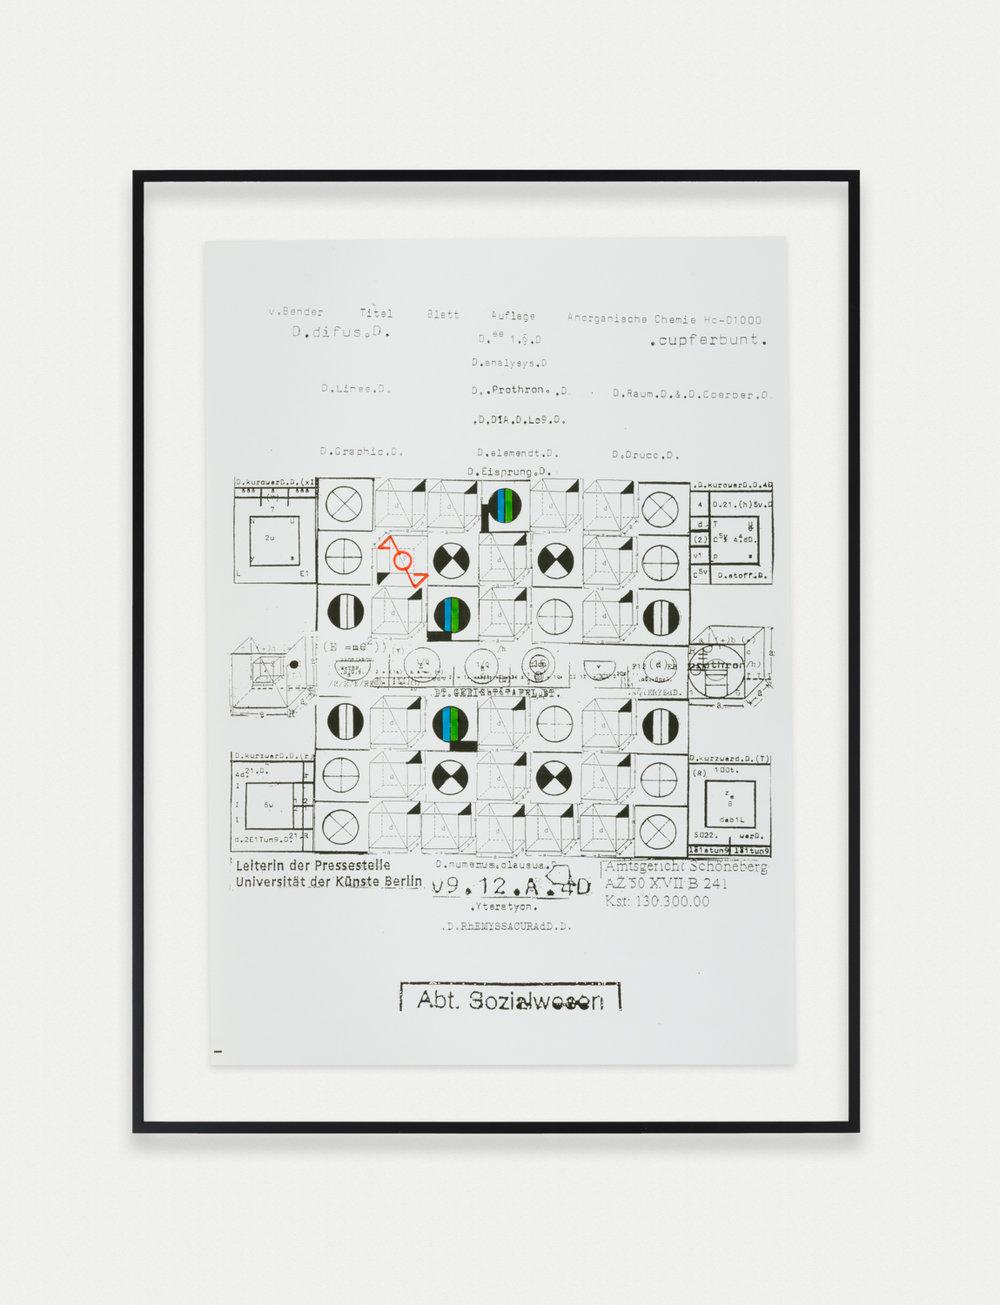 Adelhyd van Bender Untitled 1999-2014 Mixed media on photocopy 16.5 x 11.75 in (41.91h x 29.85w cm) AVB019